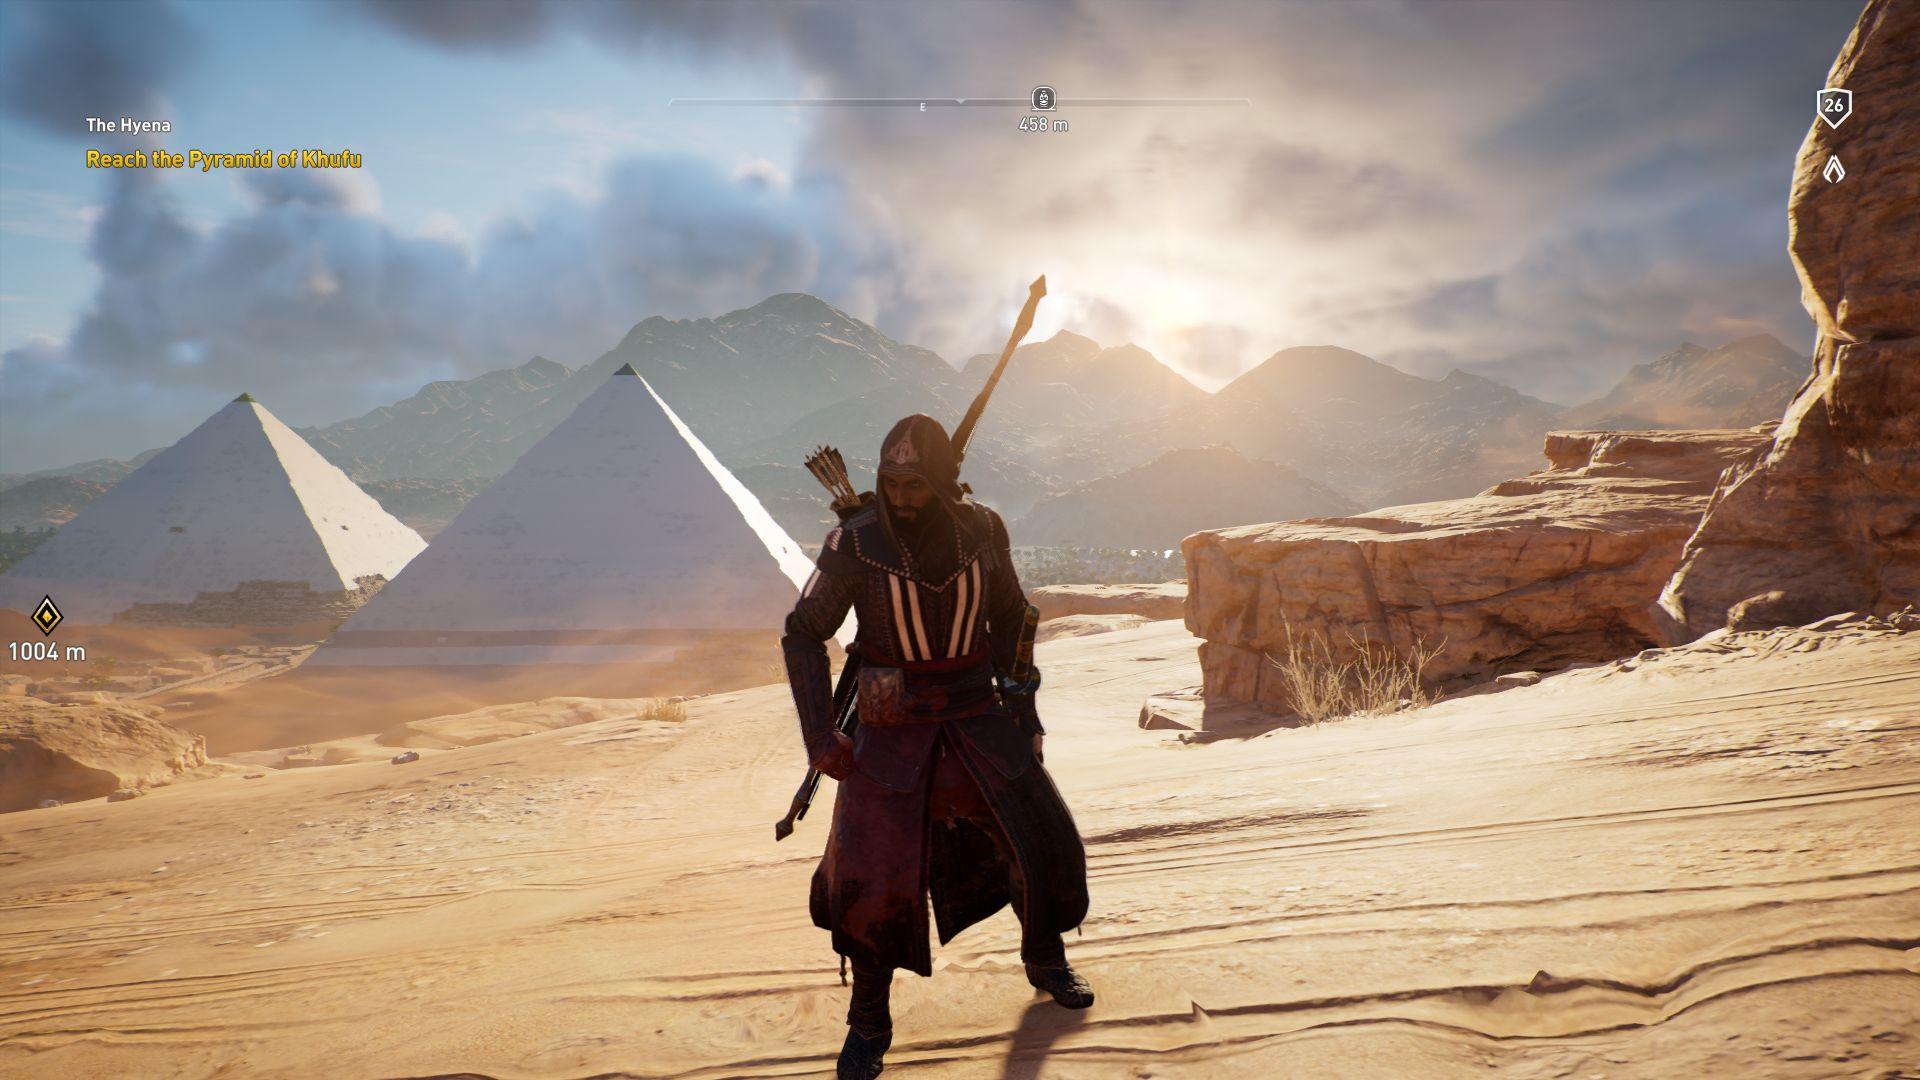 assassins-creed-origins-screenshot-2019-01-21-20-10-18-09